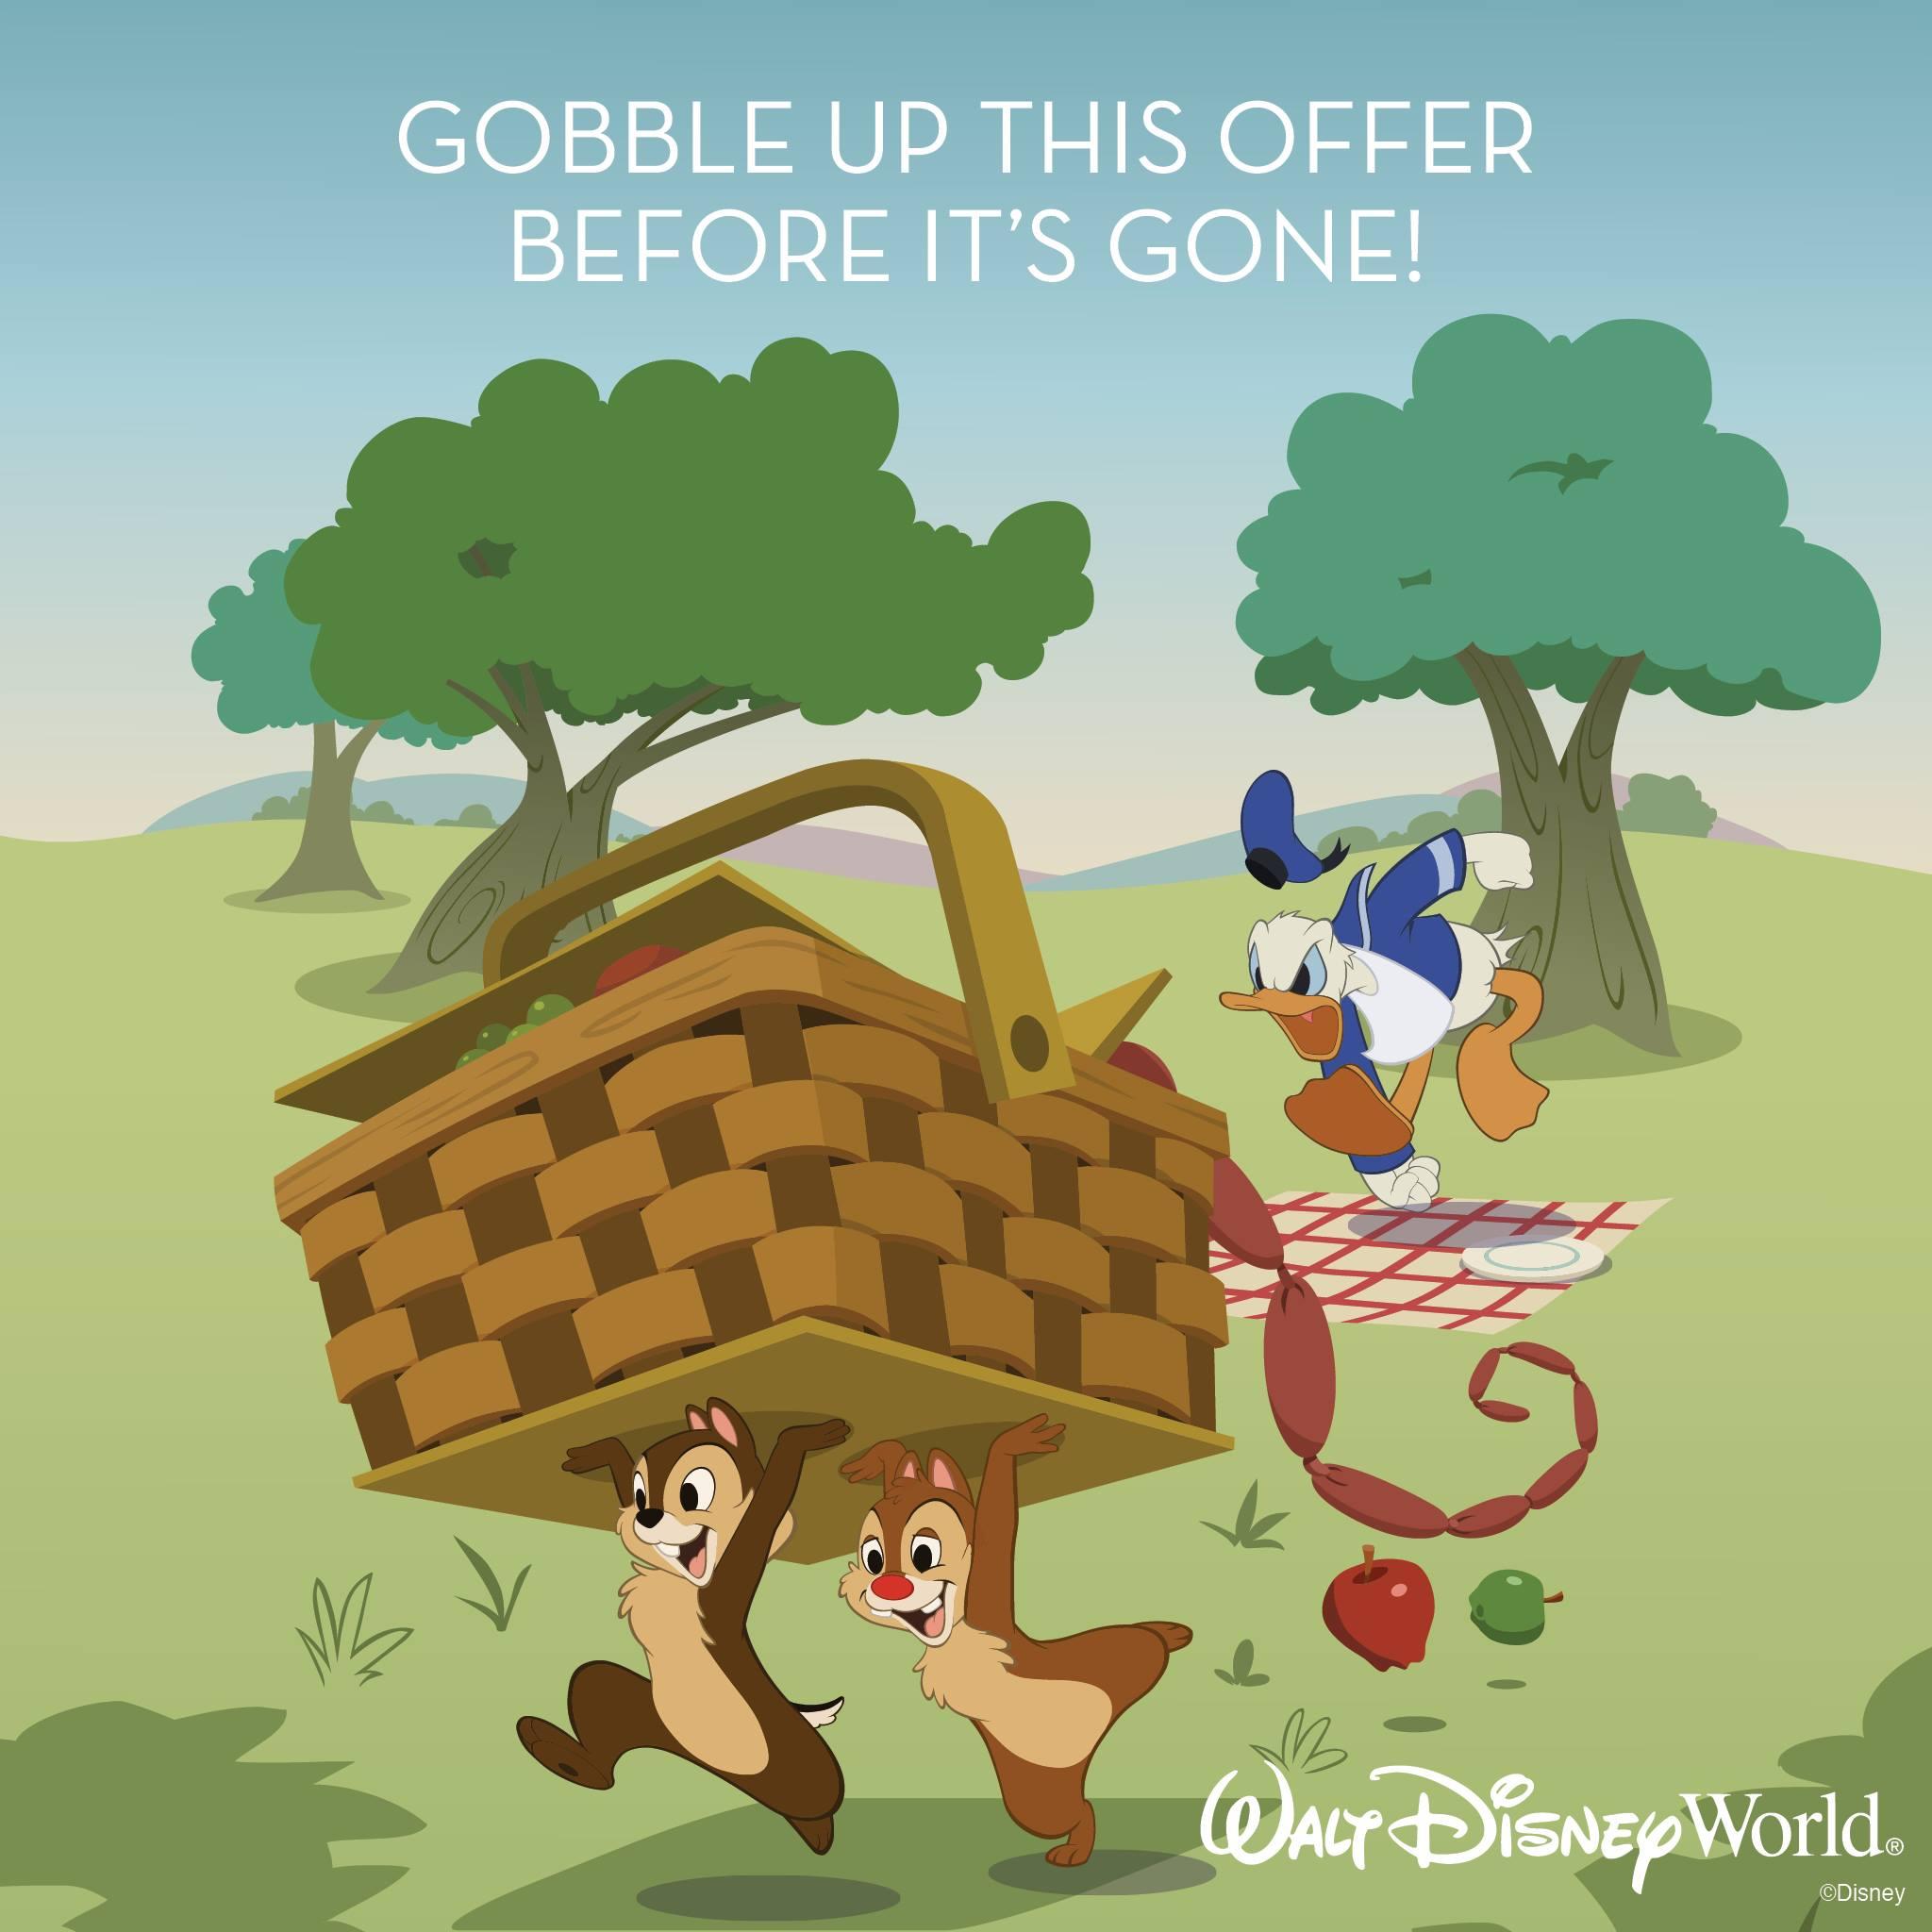 NEW Walt Disney World Savings for Winter!